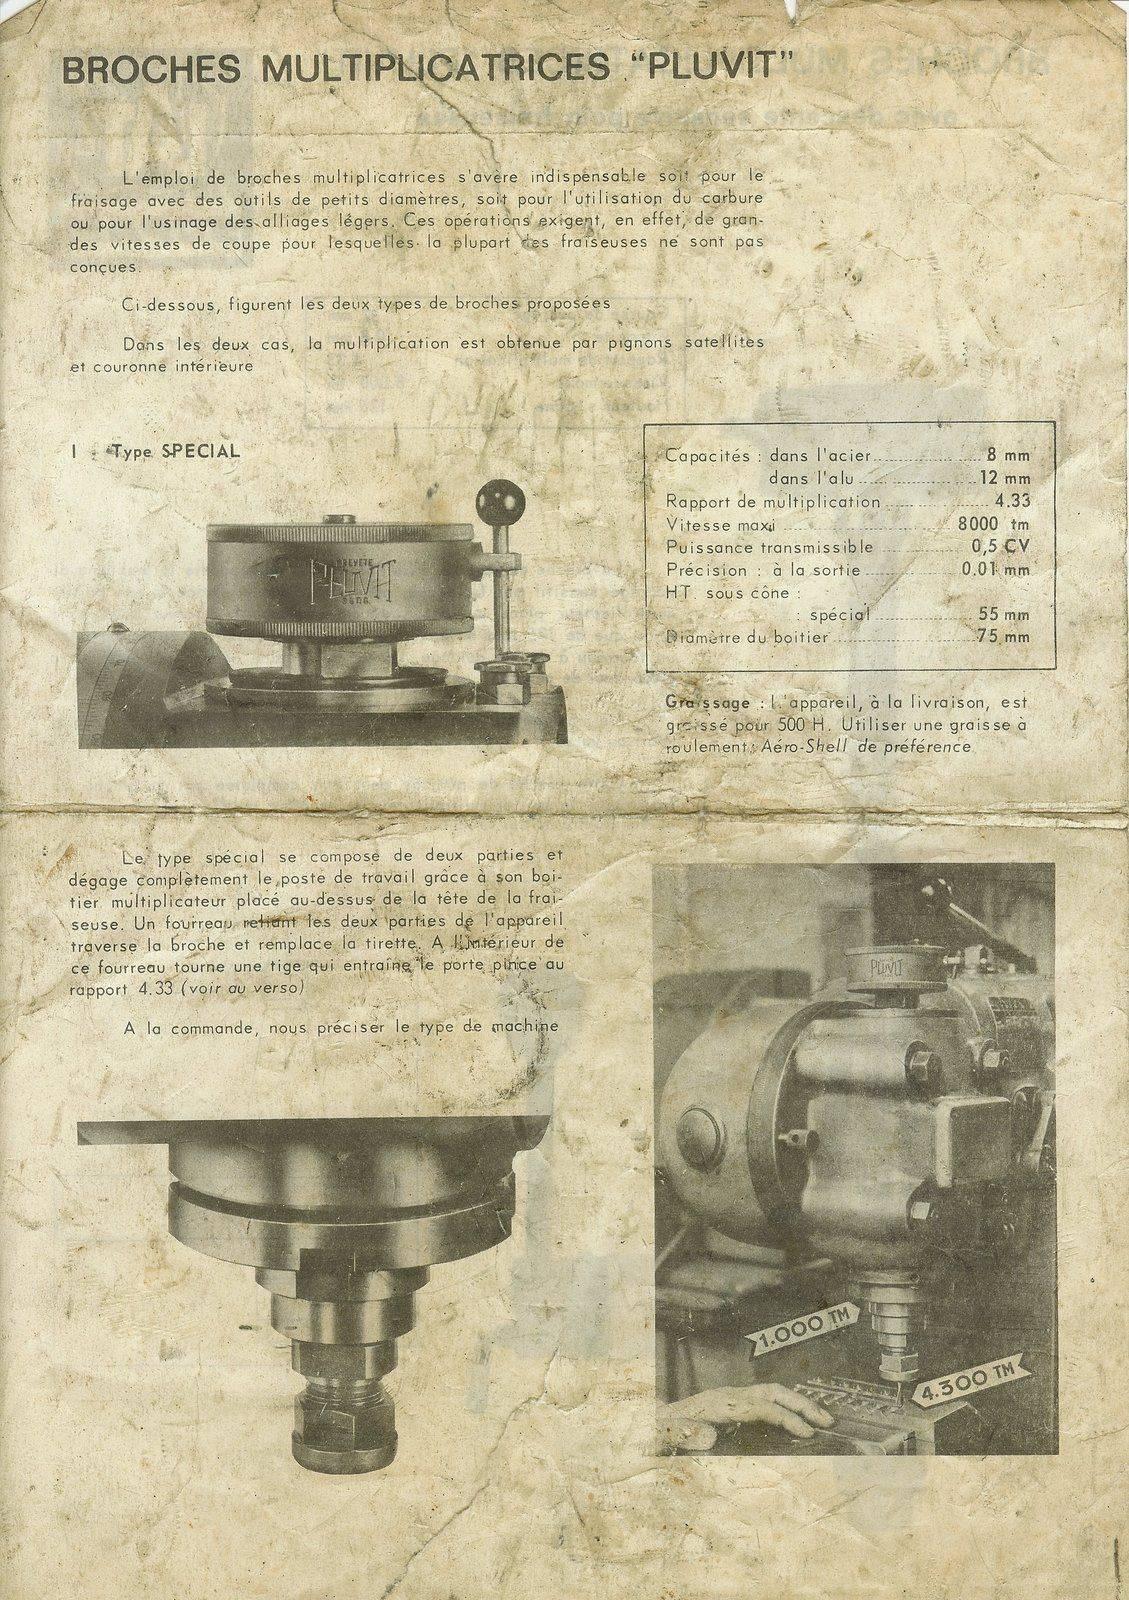 LAT SOPAM PLUVIT (1).JPG